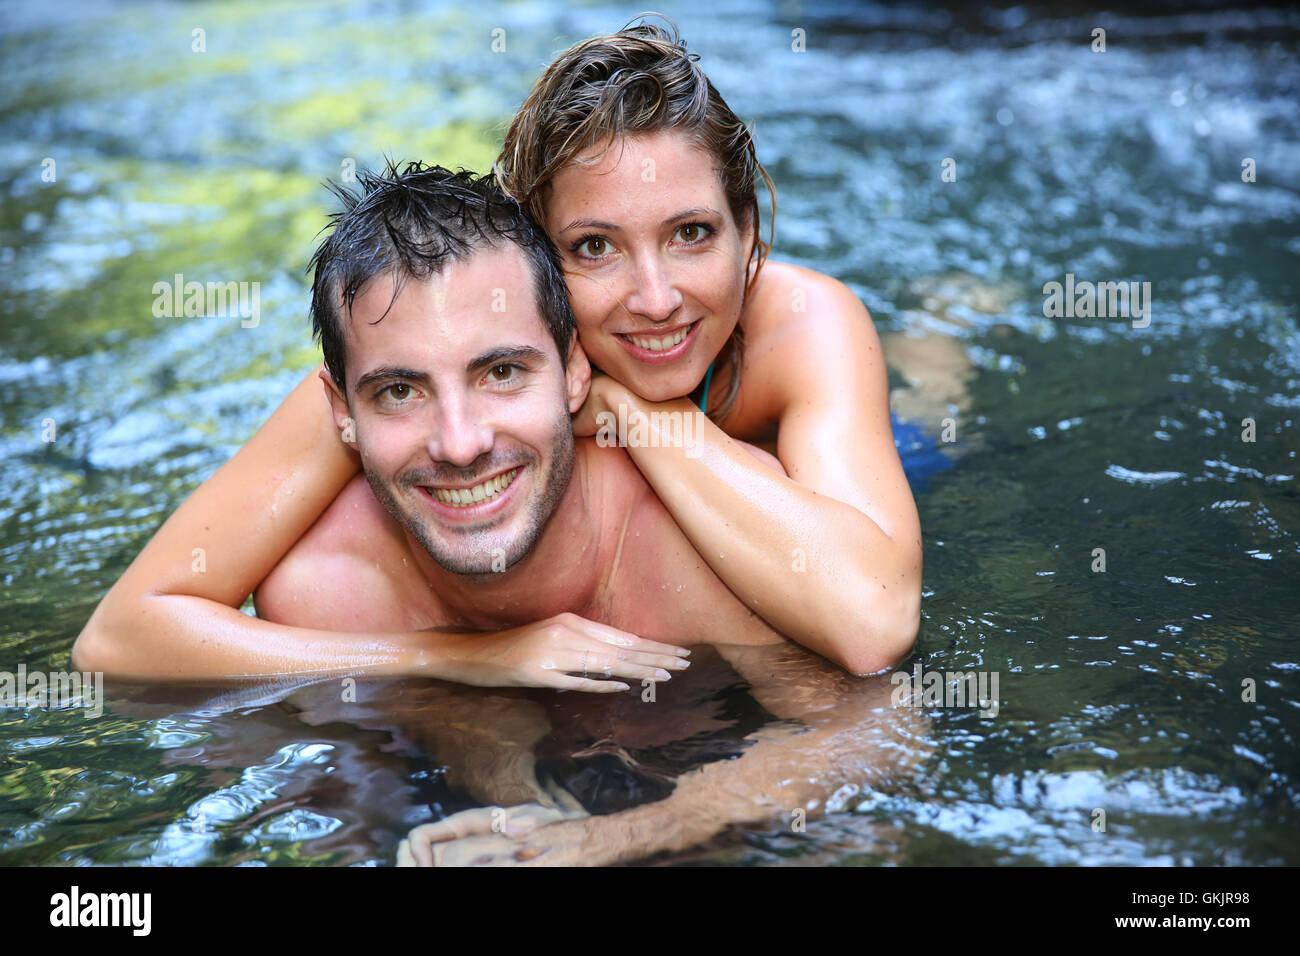 Фото семейной пары на отдыхе секс, Секс на пляже частное фото семейных пар 11 фотография